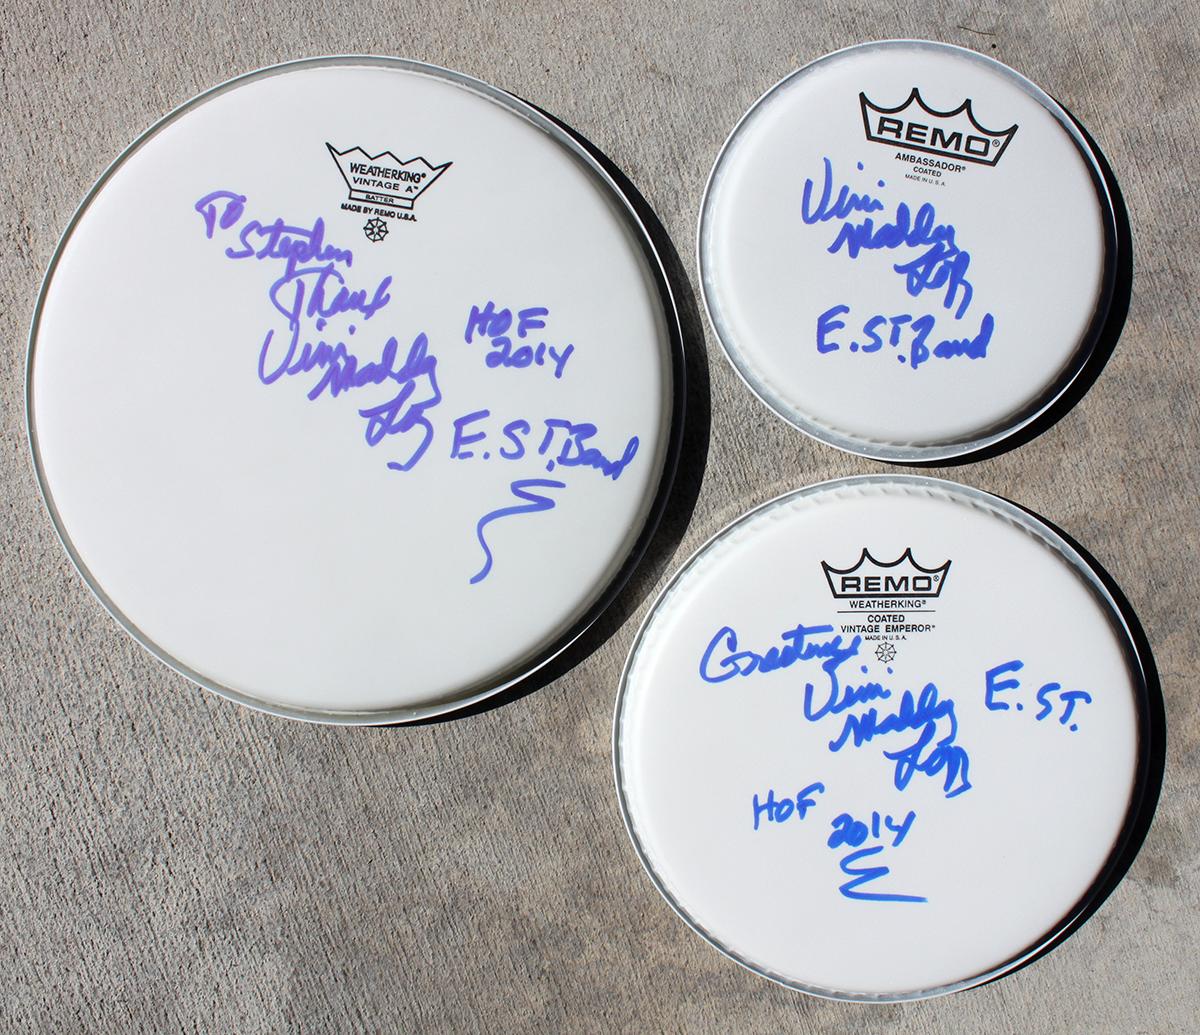 Vini Lopez - Drumheads #2